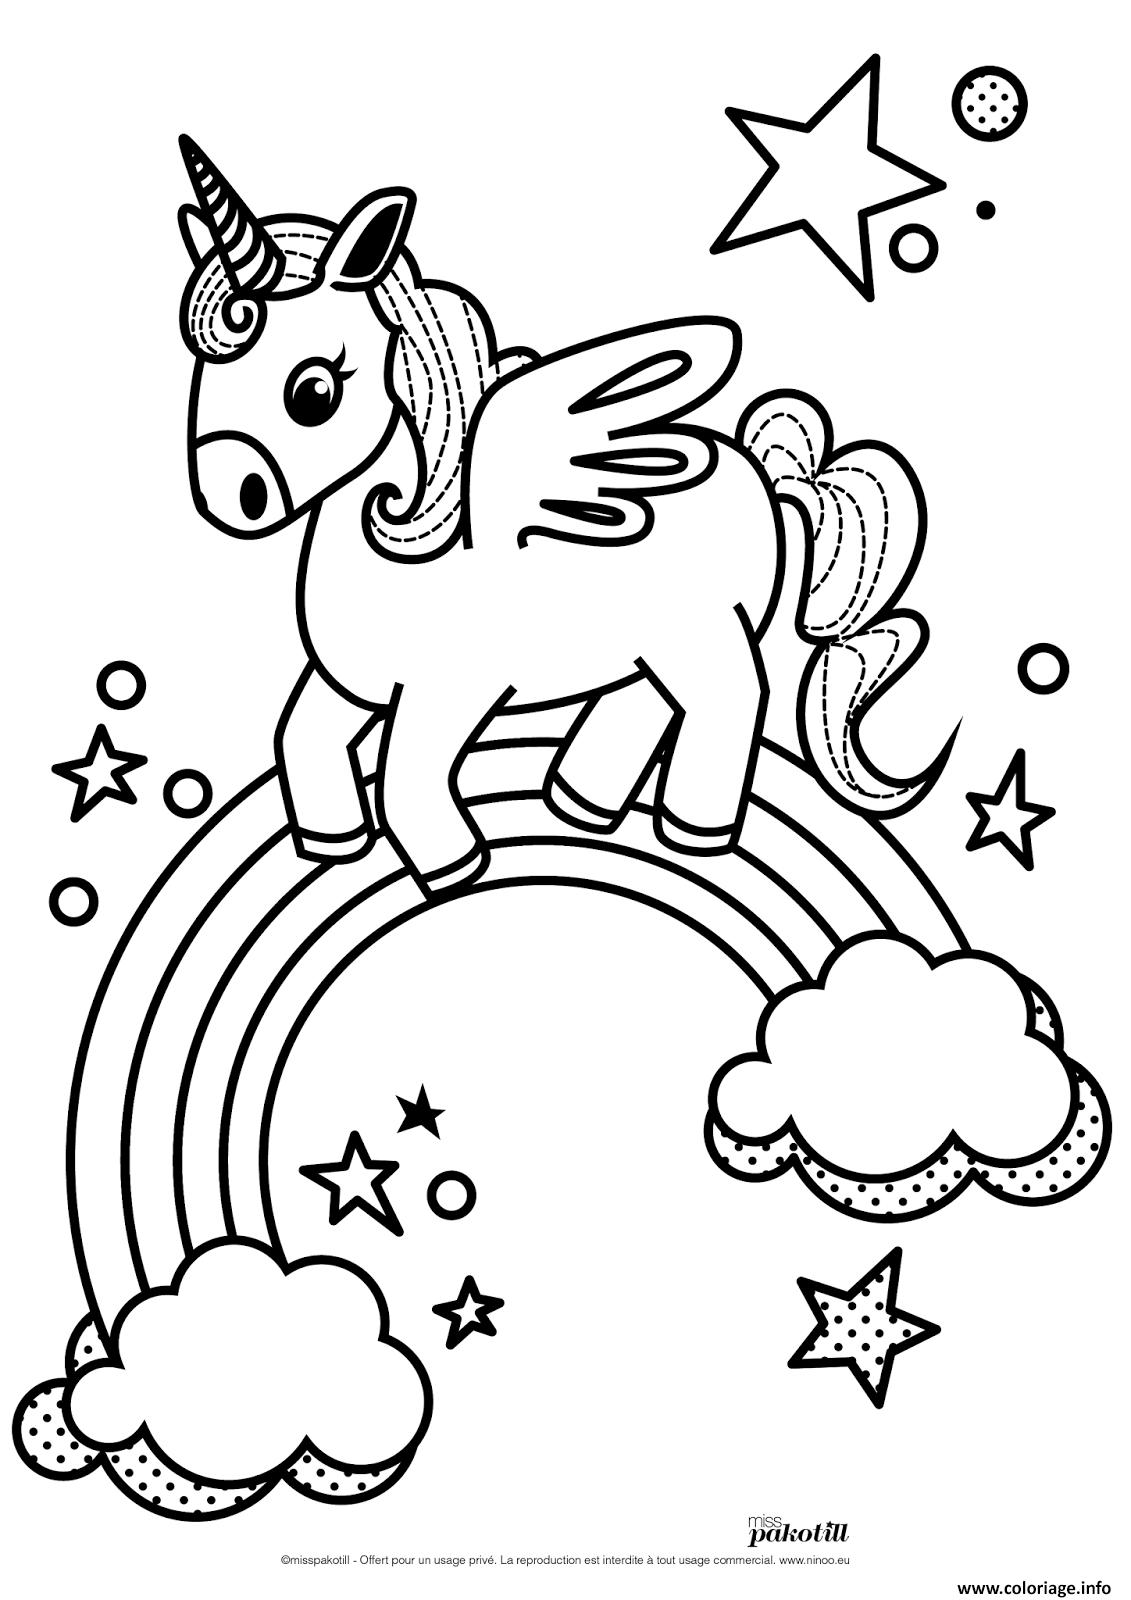 coloriage a imprimer kawaii licorne